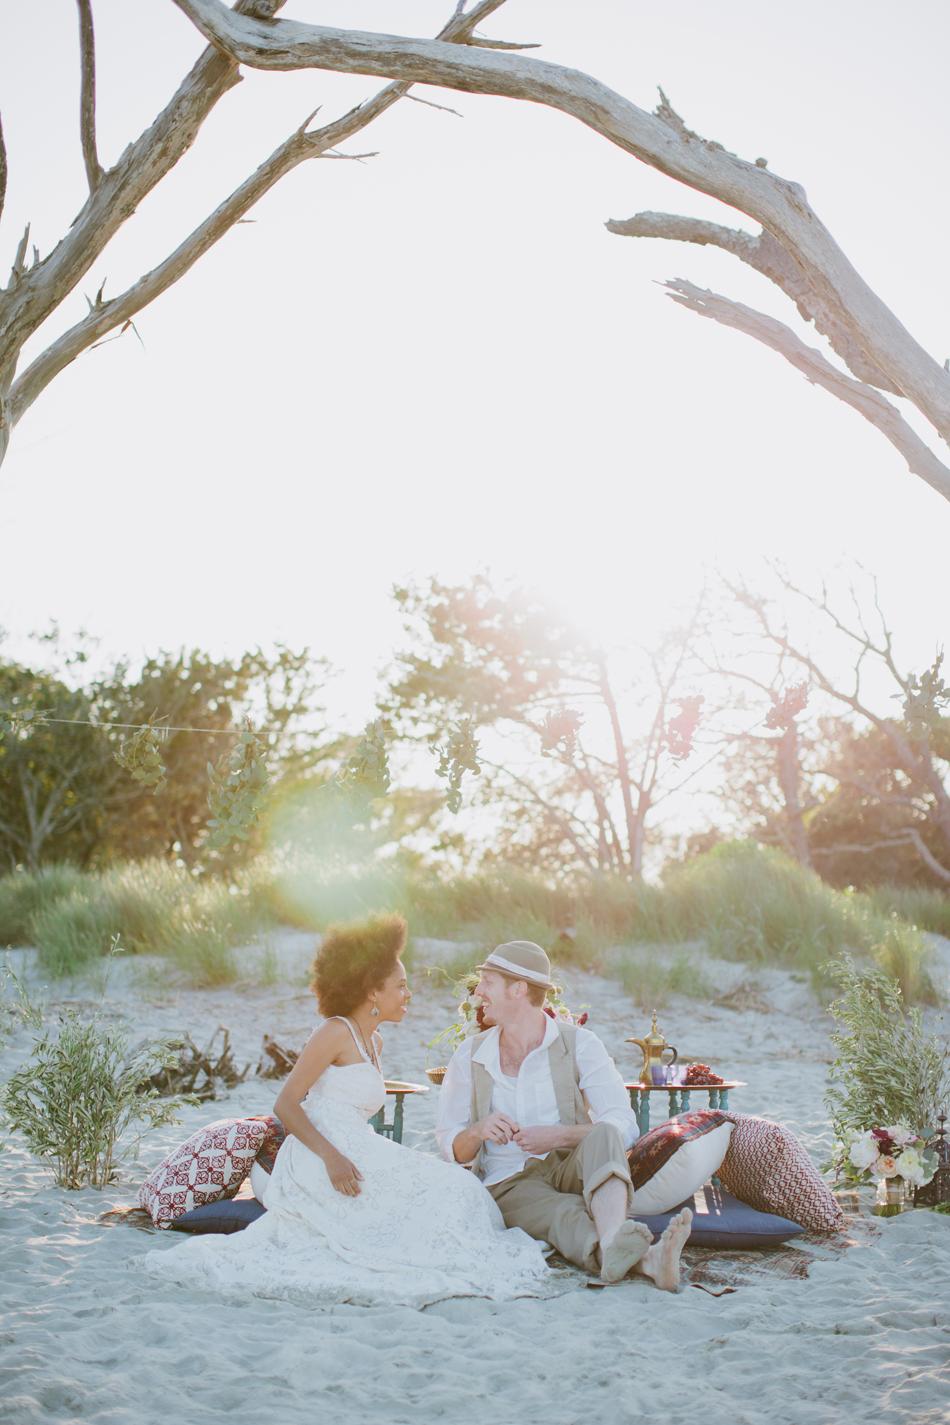 Jameykay_arlie_bohemian_elopement_styled_shoot052.jpg